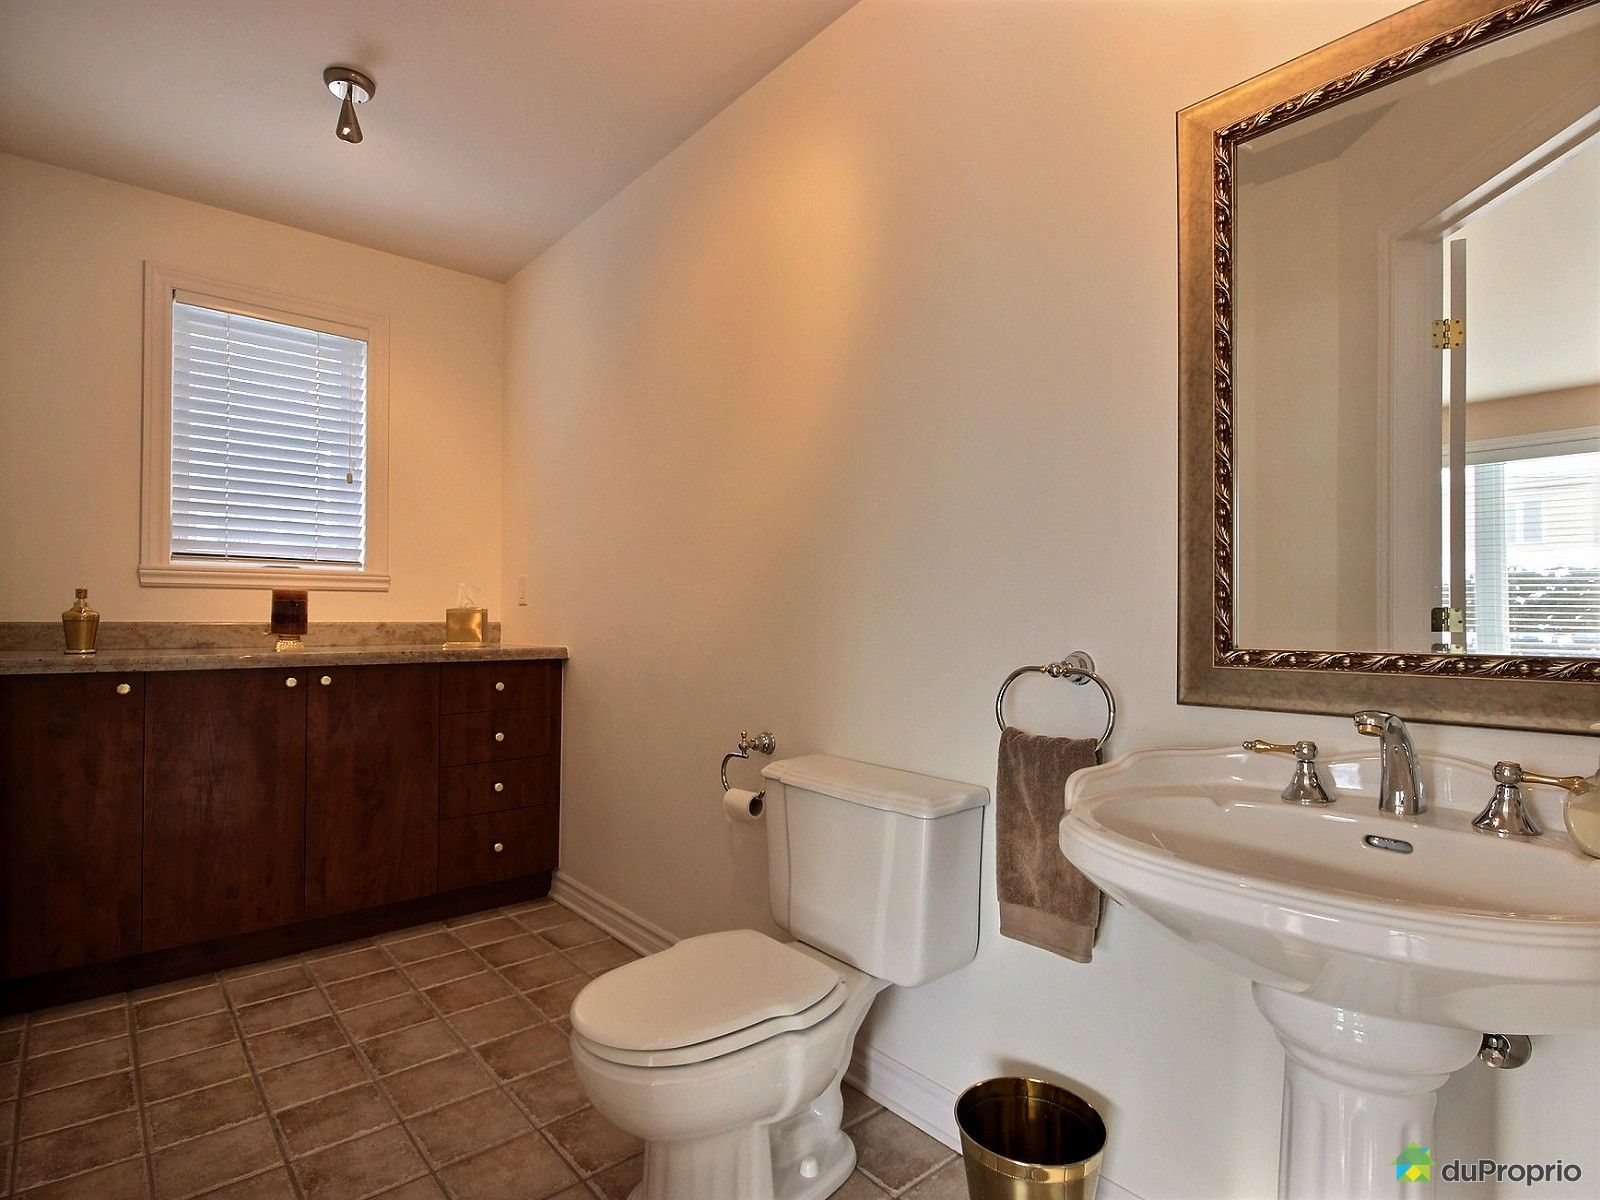 maison vendre vimont 447 rue d 39 assise immobilier qu bec duproprio 585075. Black Bedroom Furniture Sets. Home Design Ideas